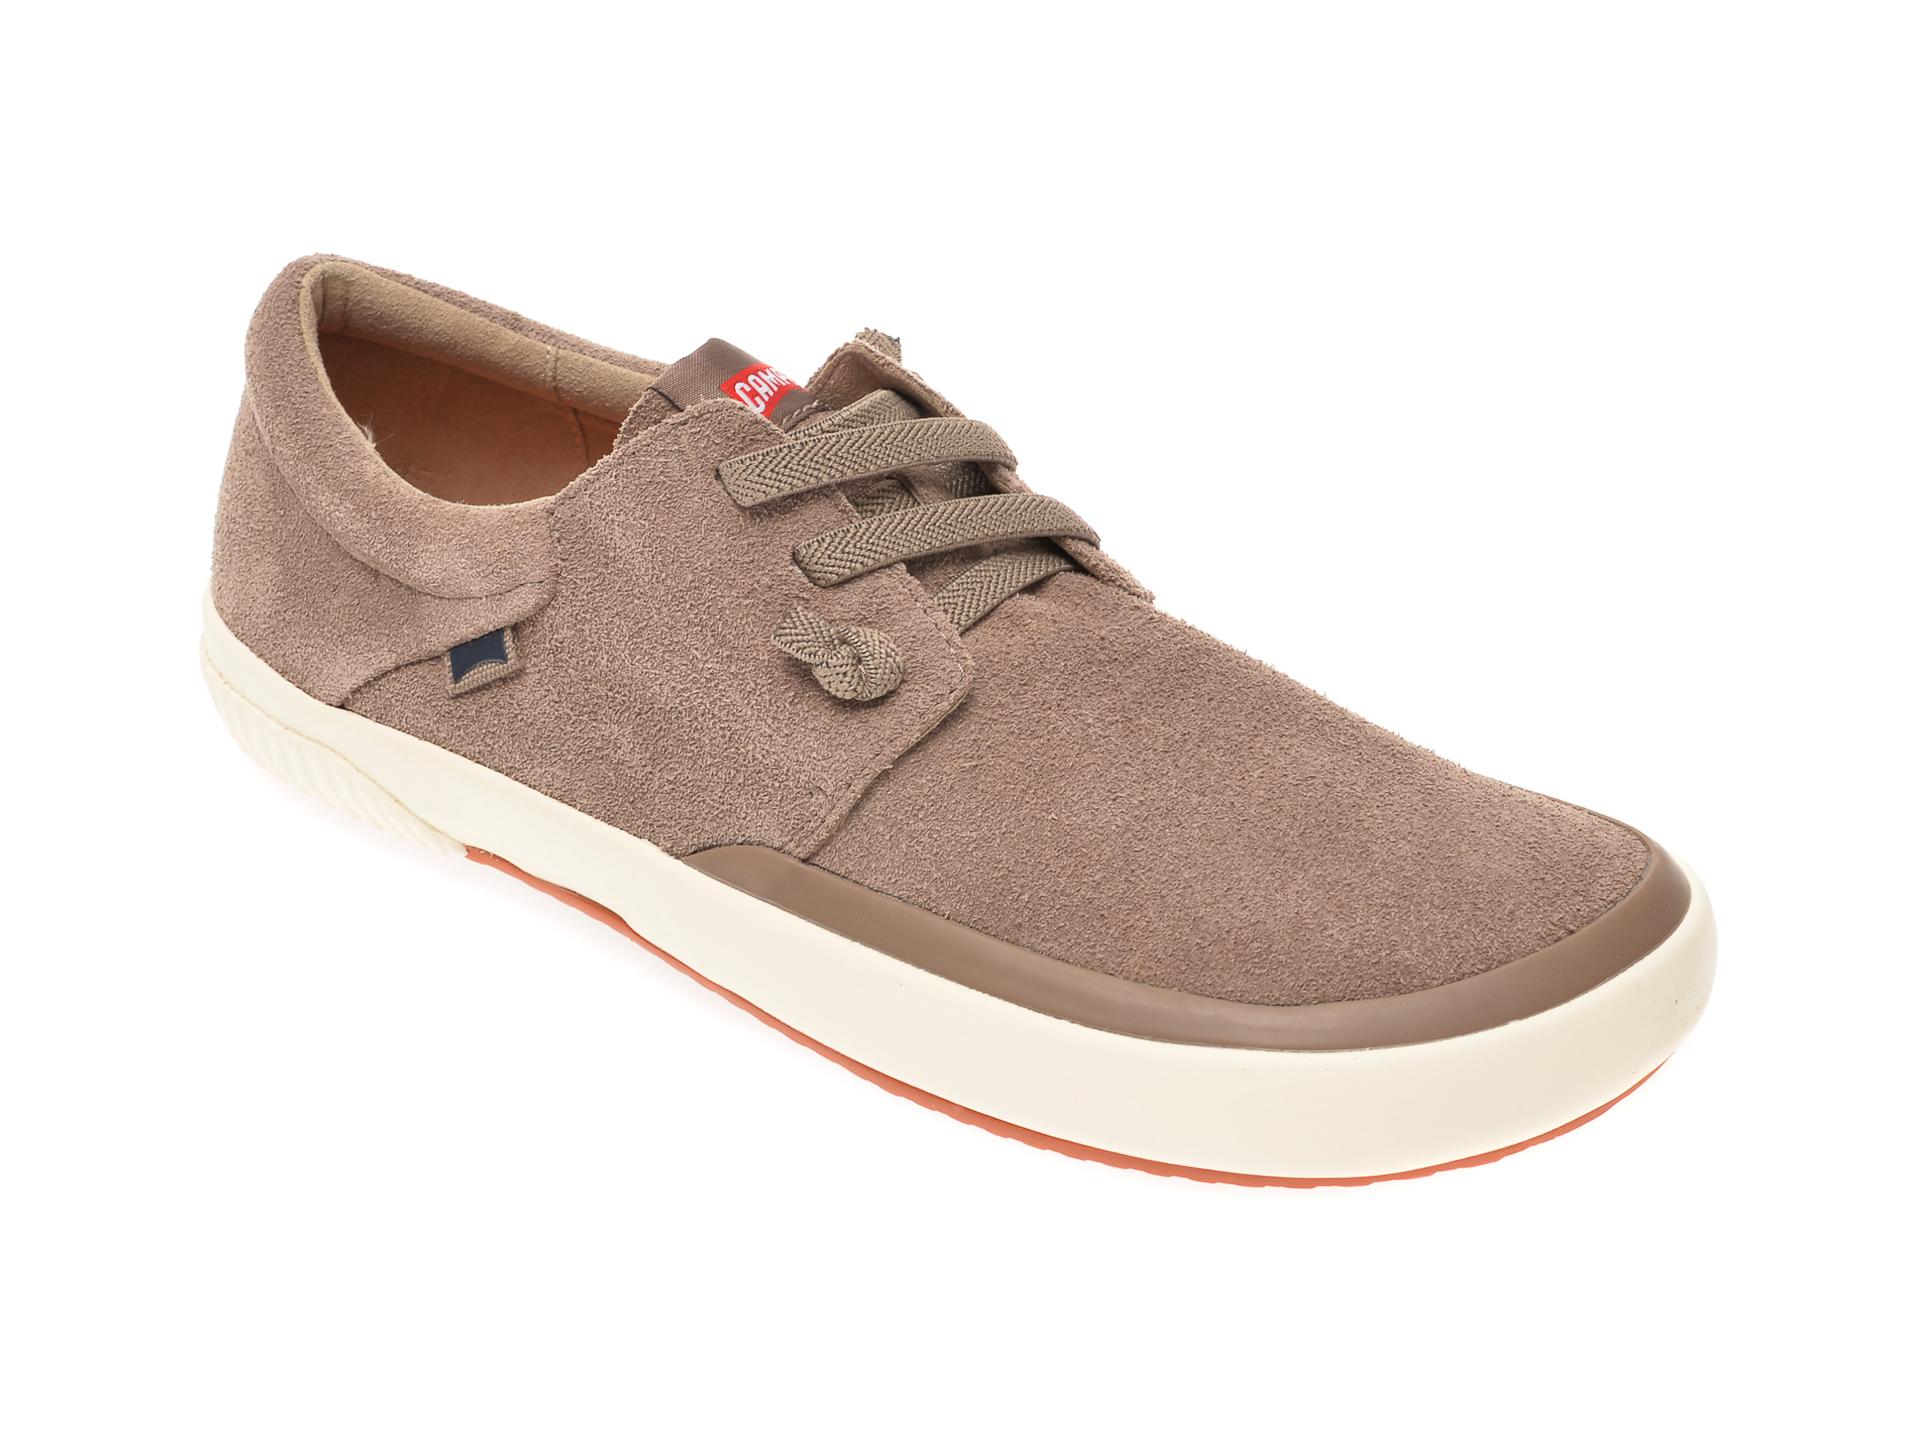 Pantofi CAMPER maro, K100414, din piele intoarsa imagine